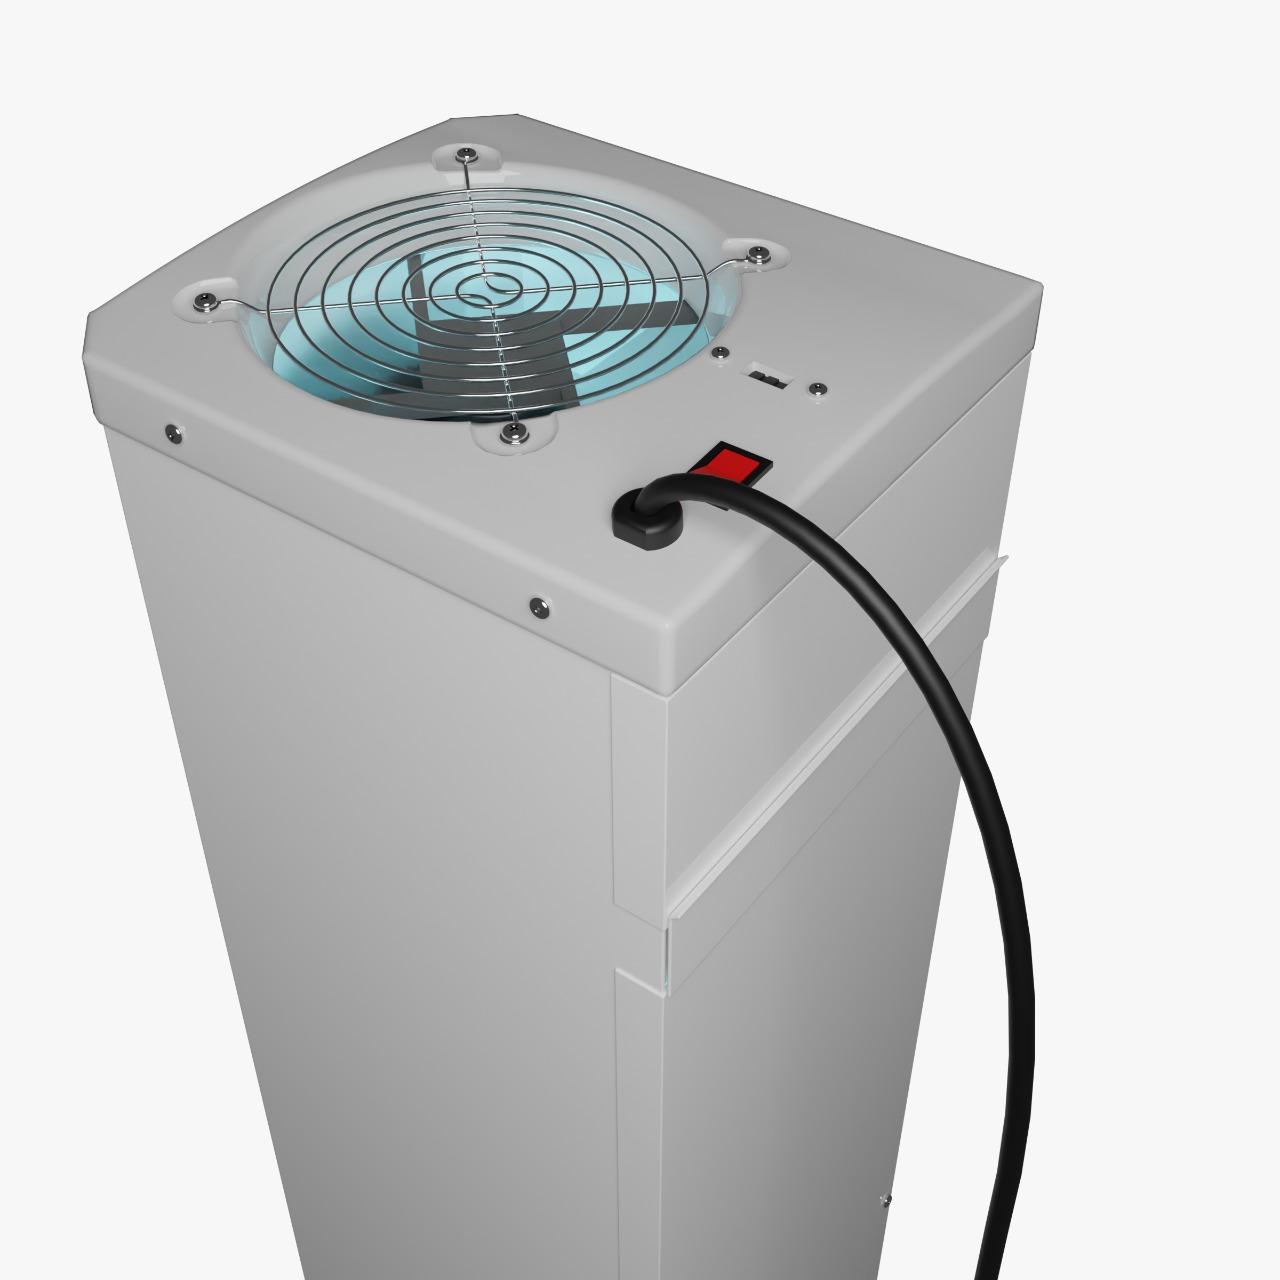 Sterilight Aero Esteriliza Vírus Bactérias Luz Uv-c + controle remoto